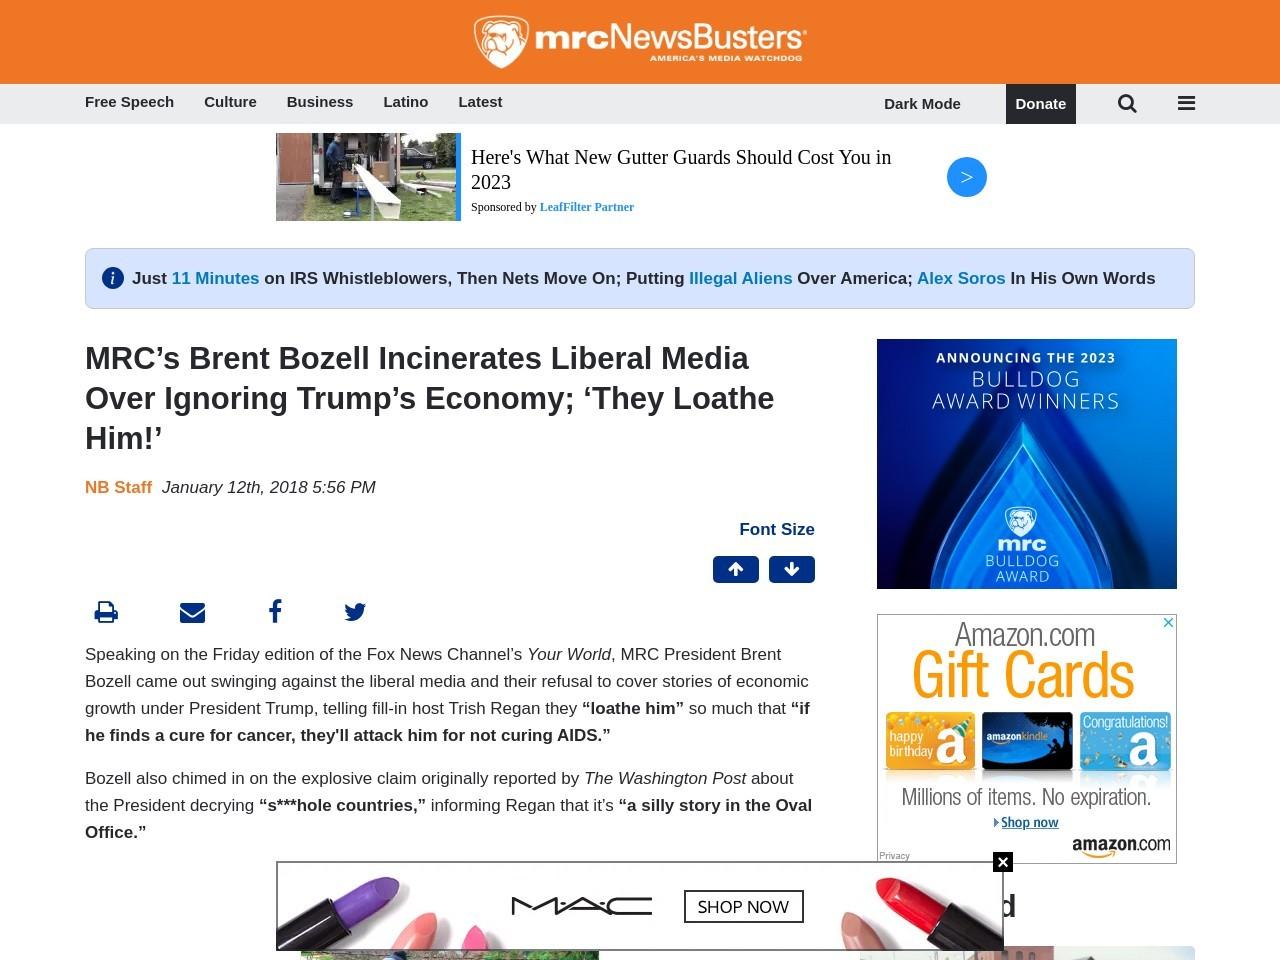 MRC's Brent Bozell Incinerates Liberal Media Over Ignoring Trump's…